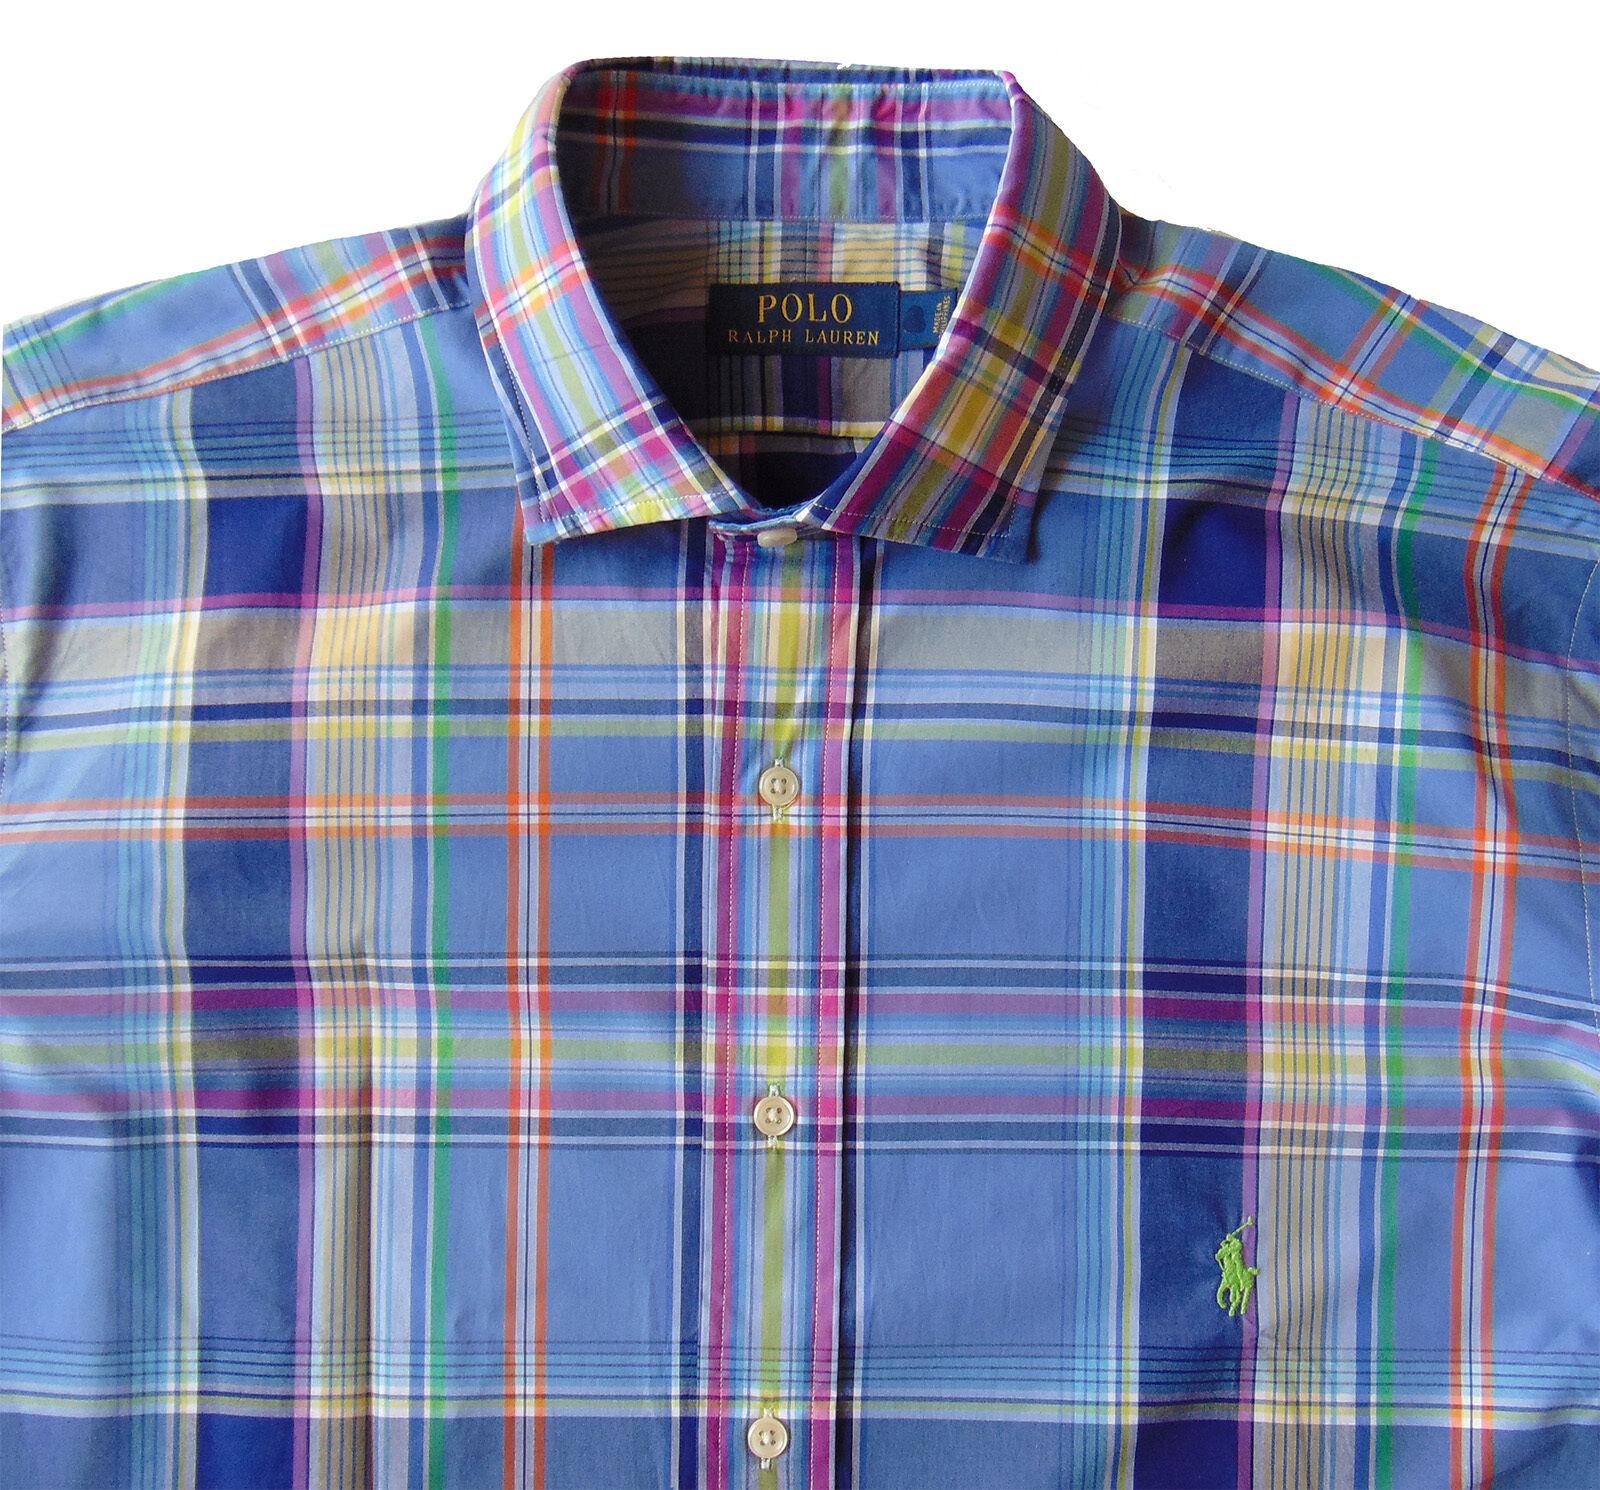 Men's POLO RALPH LAUREN bluee colors Plaid Shirt 2XB 2X 2XL BIG NWT NEW